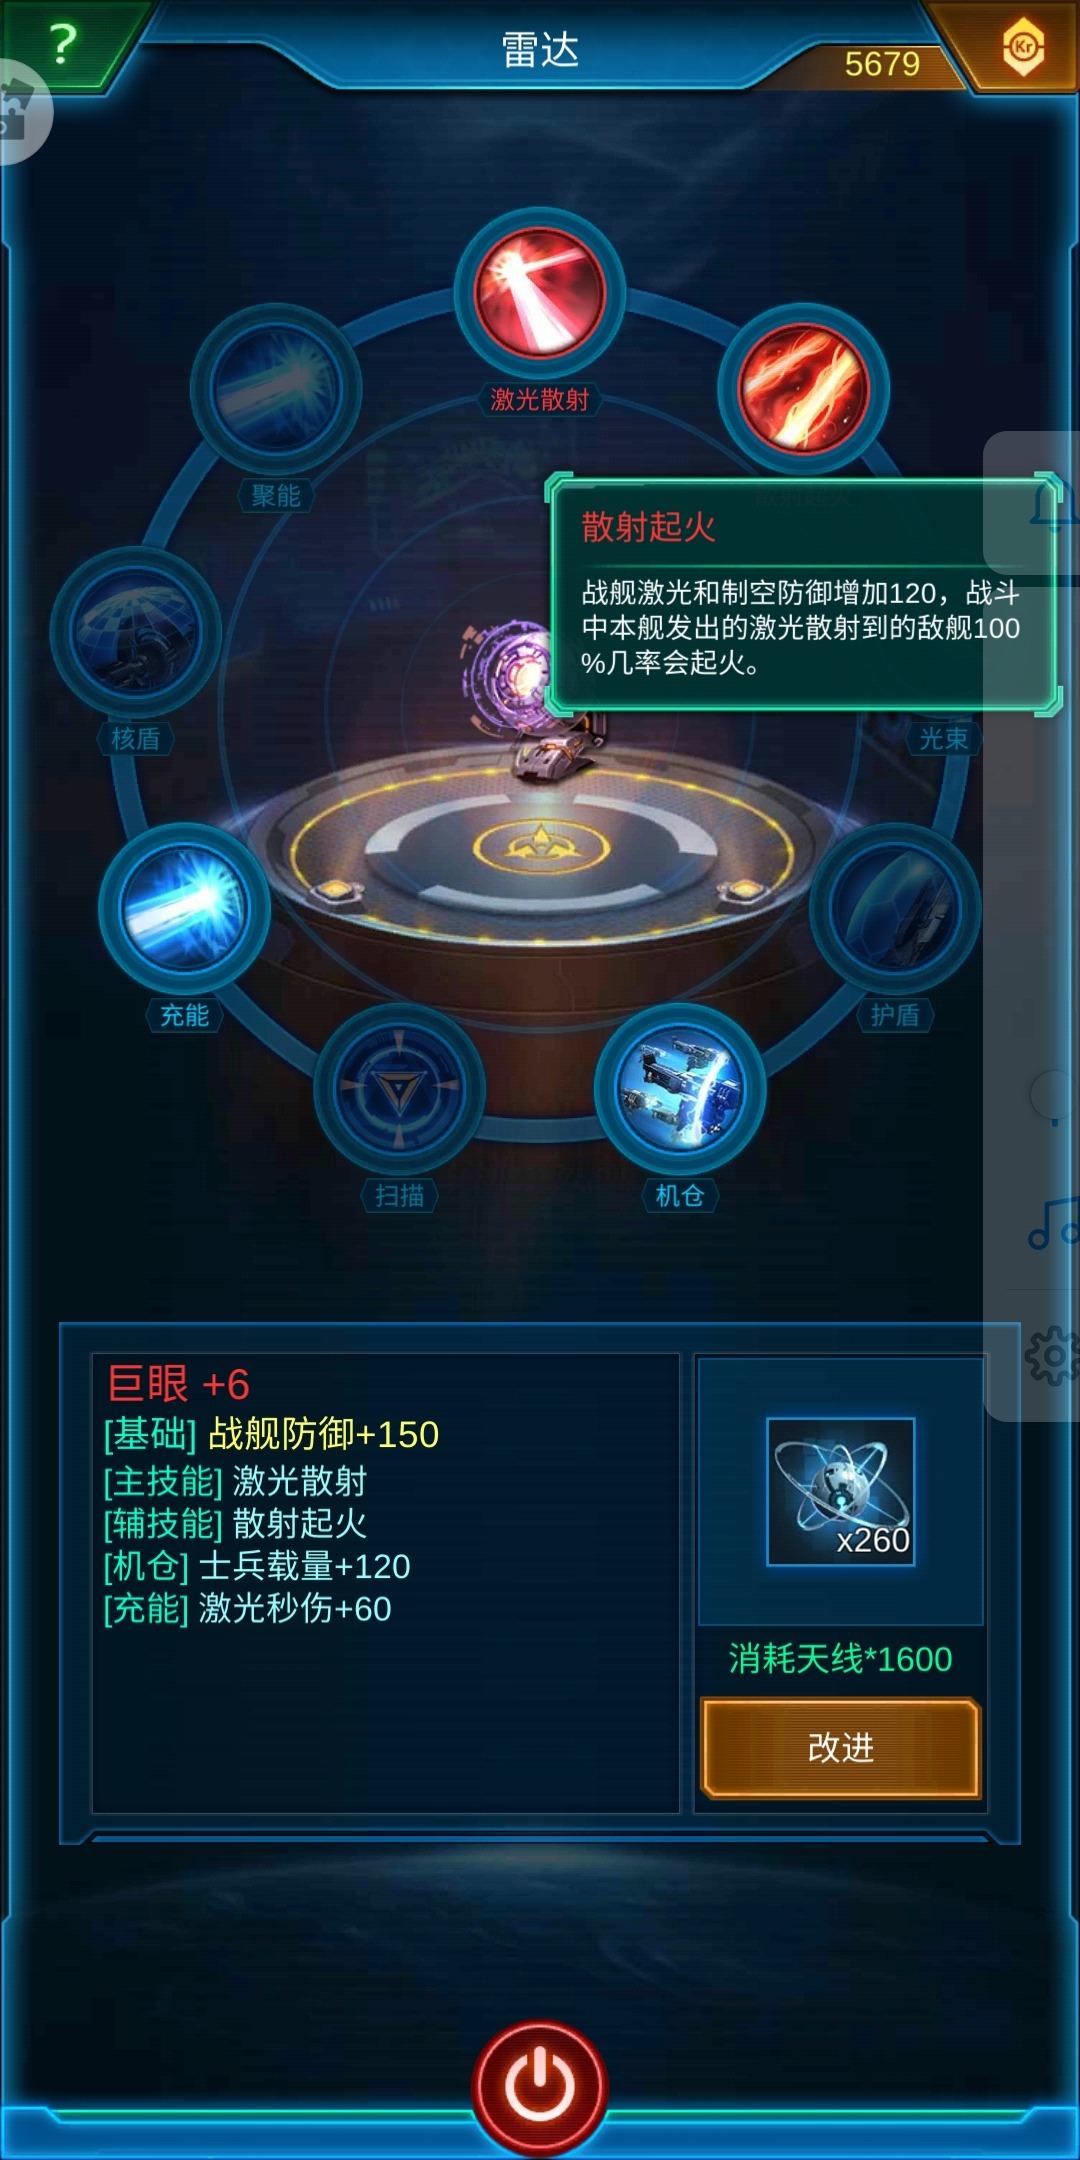 Screenshot_20200205_142731_com.jedigames.p16s.huawei.jpg